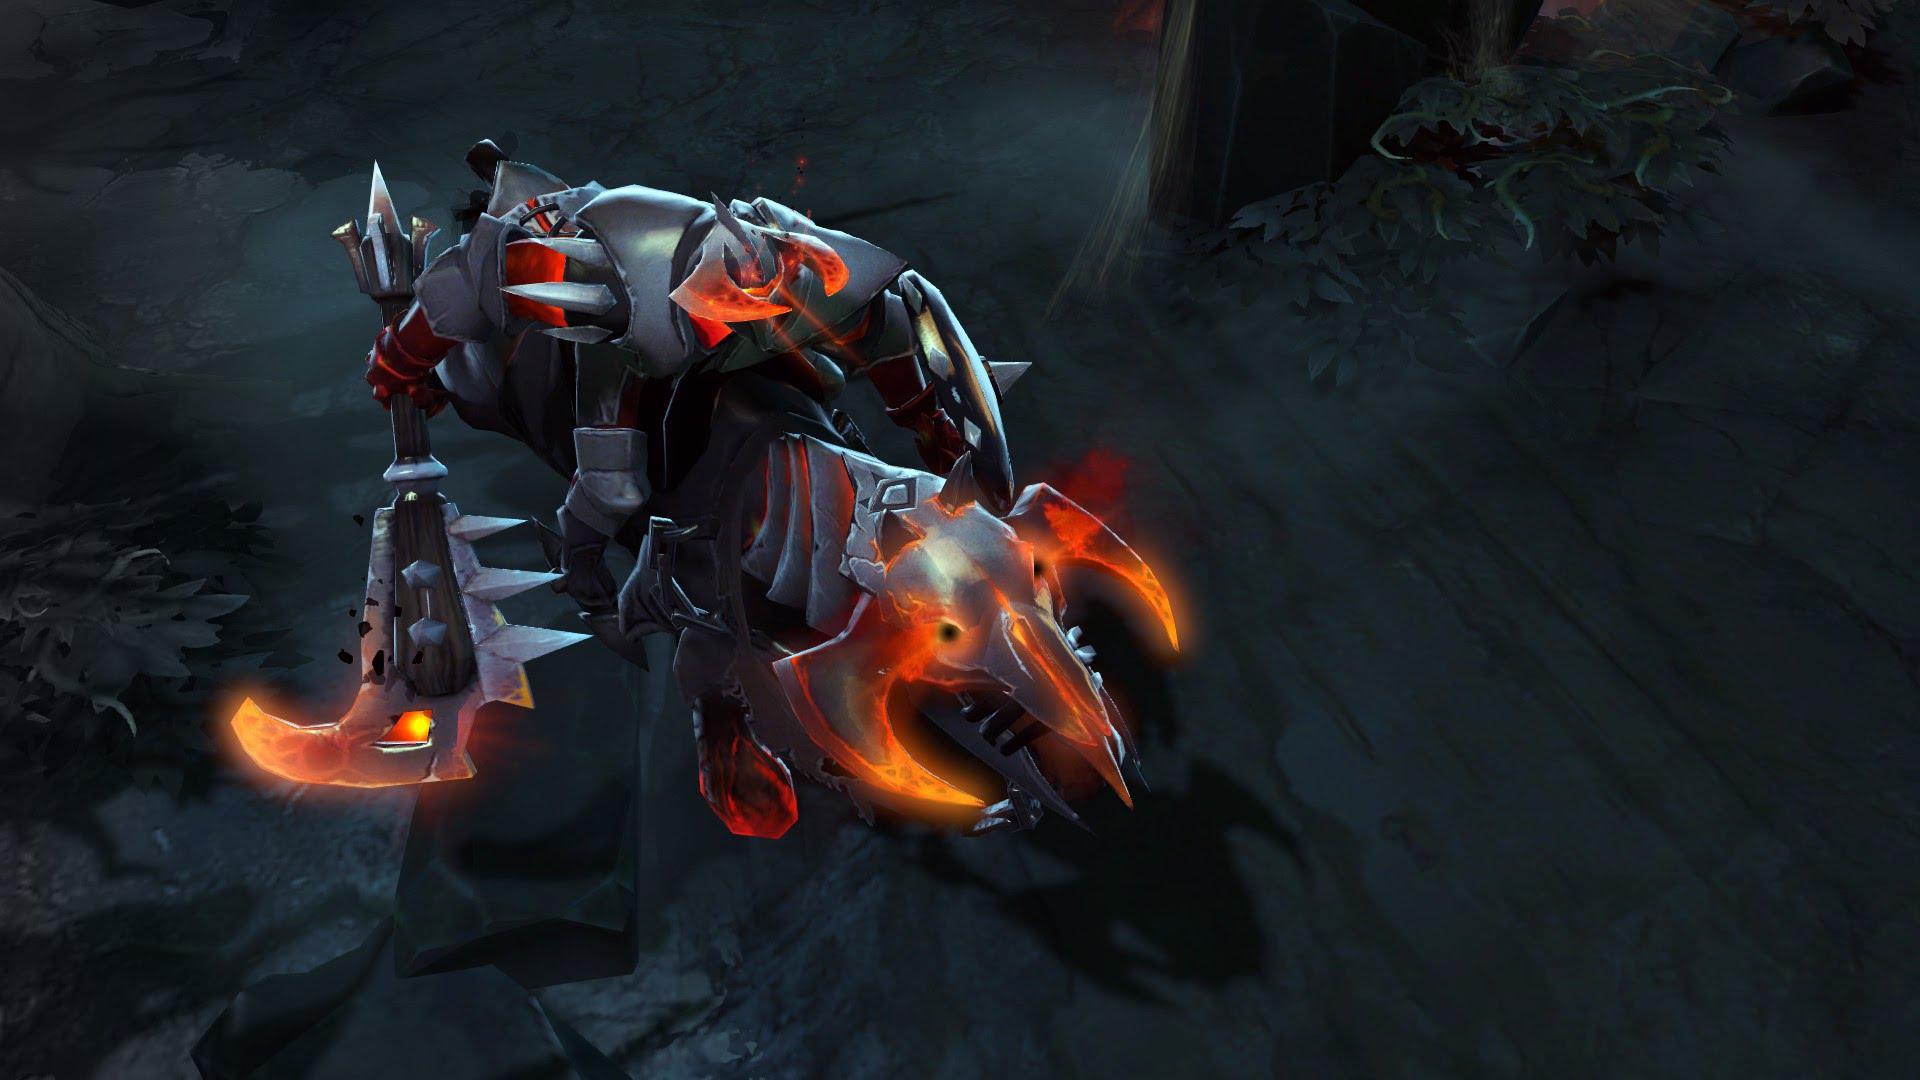 Dota2 : Chaos Knight Desktop wallpapers